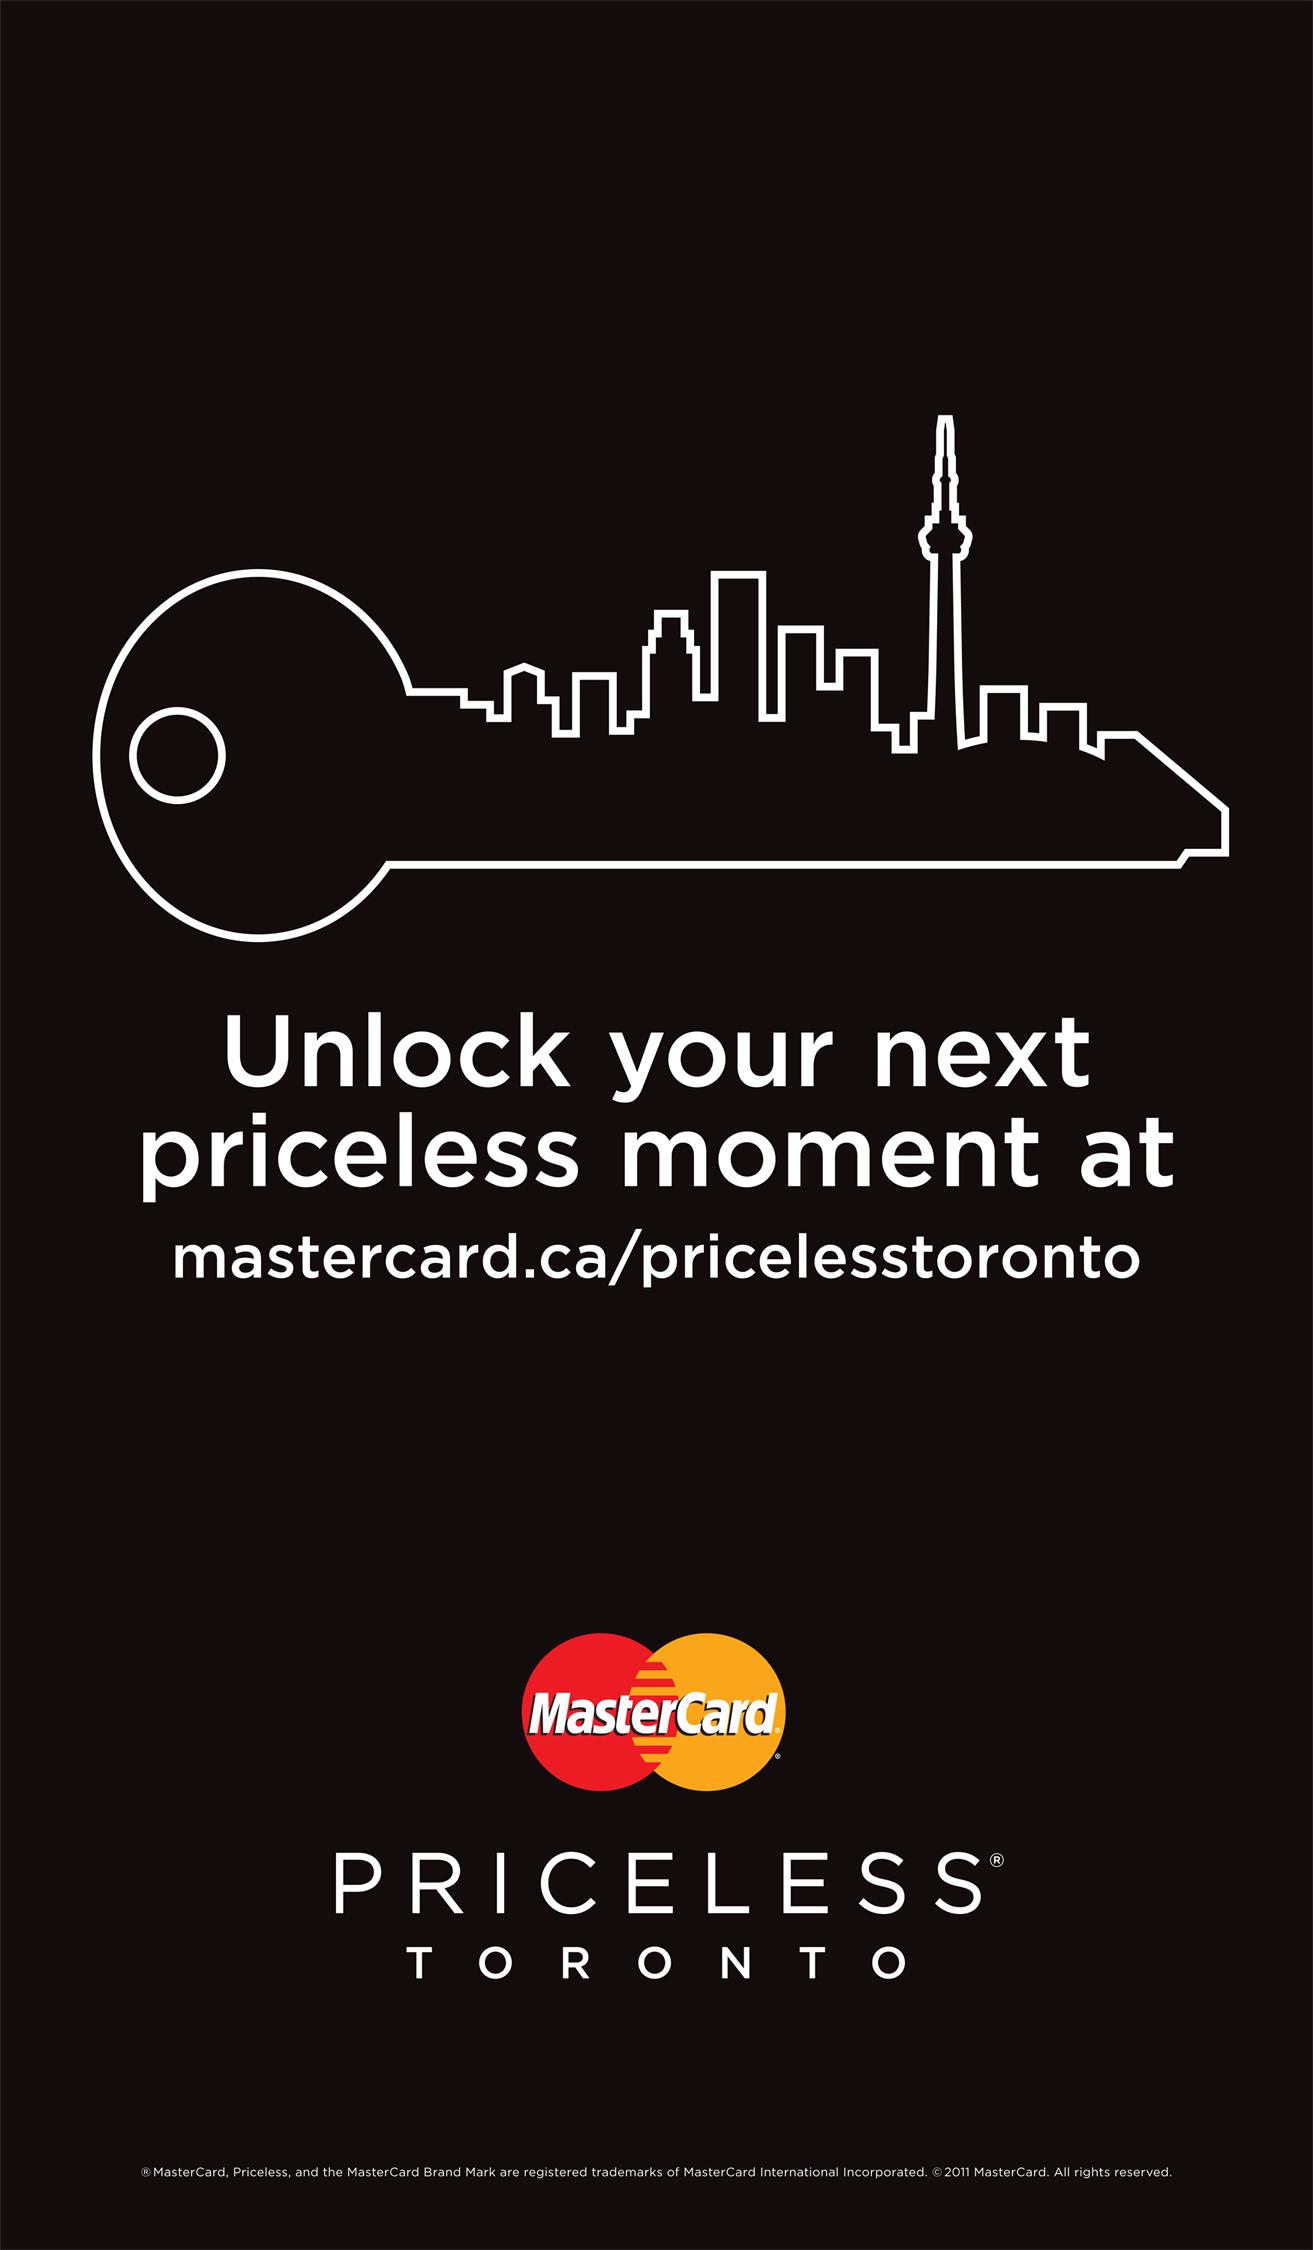 Mastercard write a priceless ad